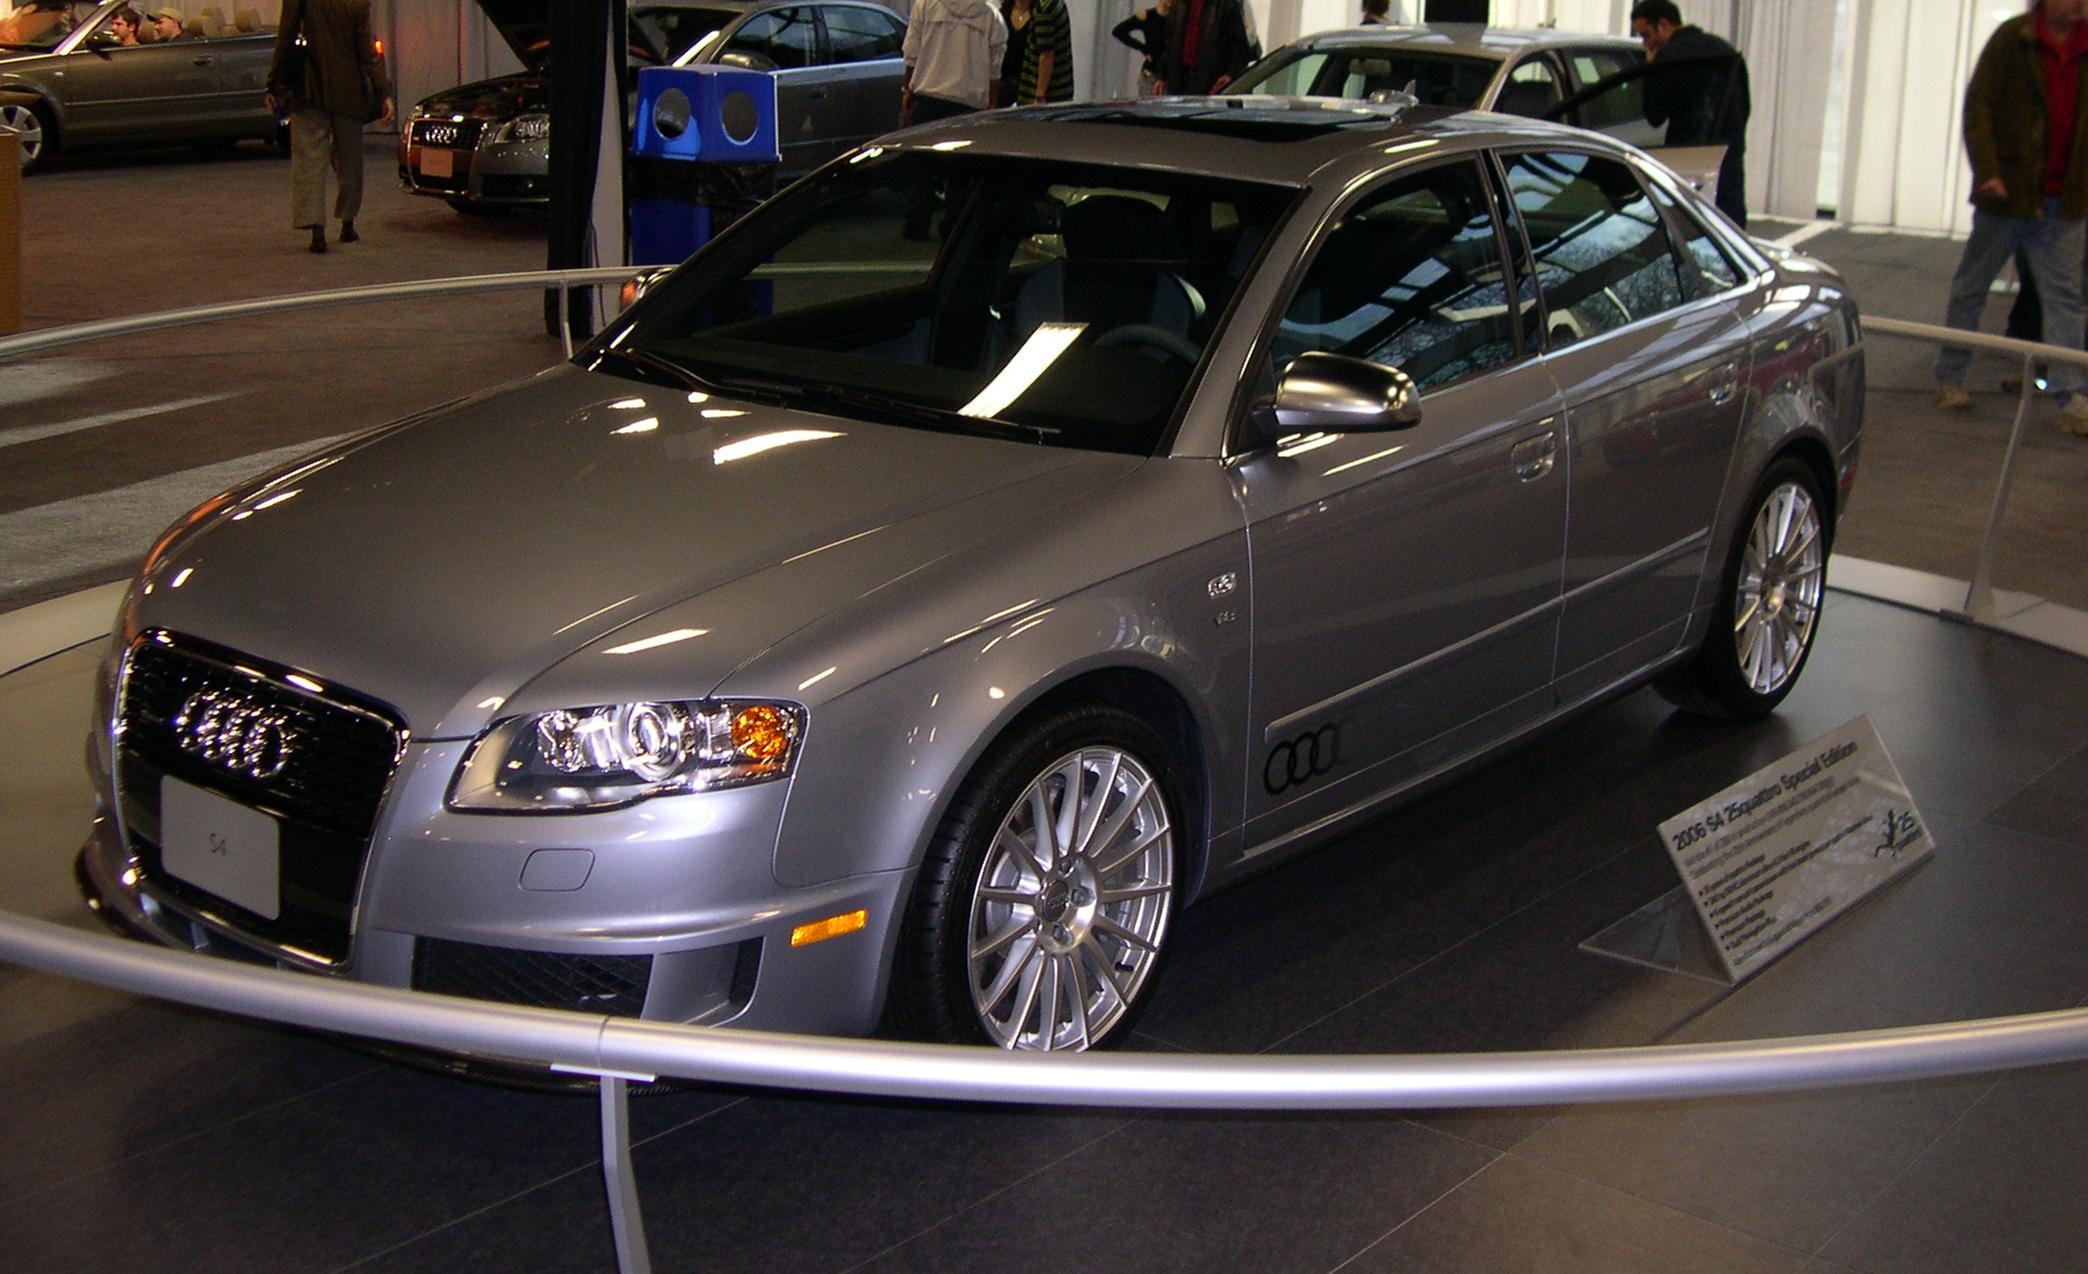 Audi s4 HD Wallpaper Download 2088x1274